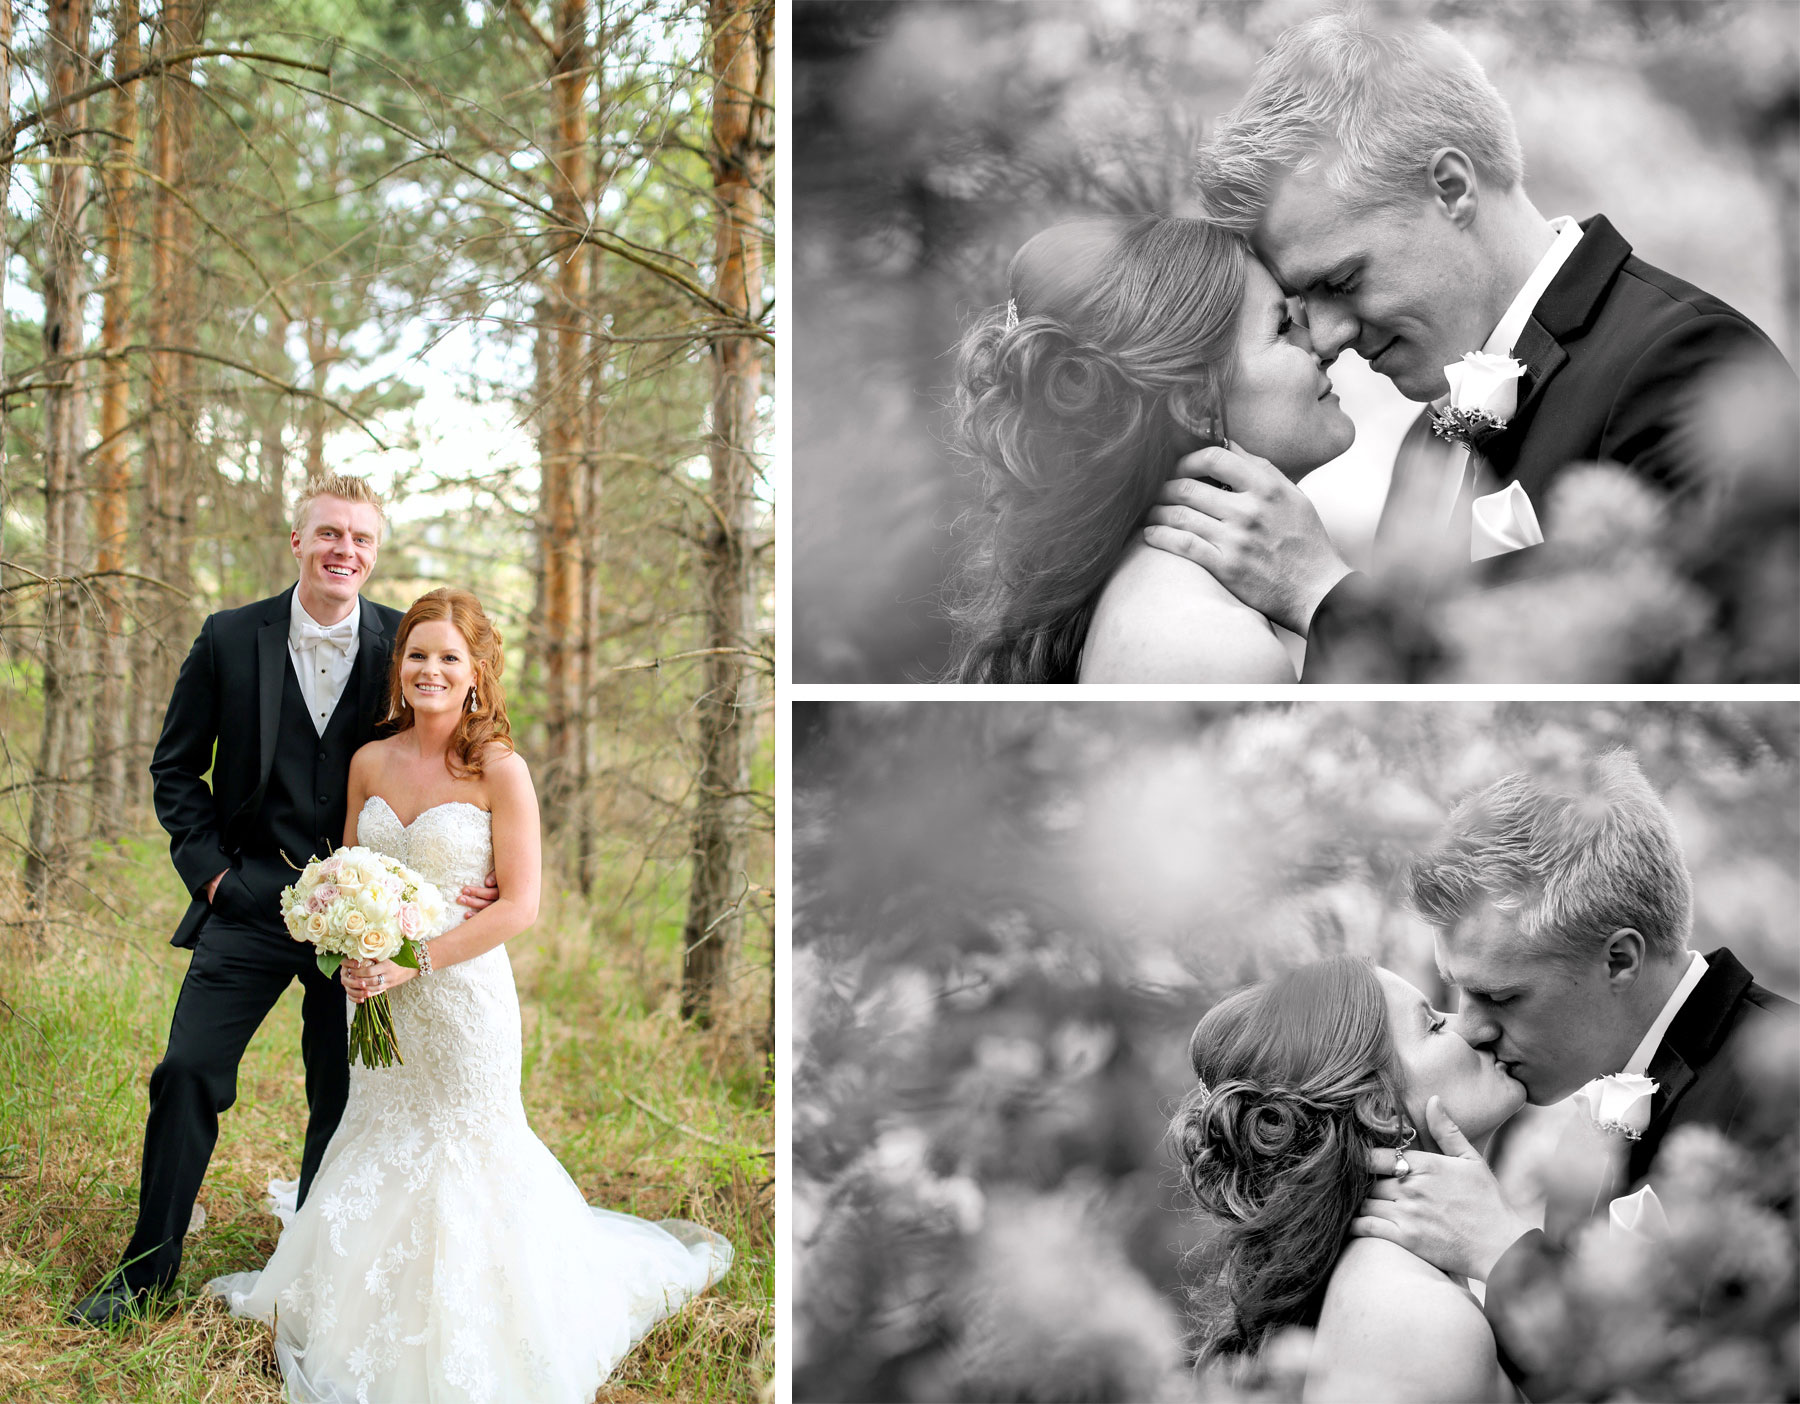 05-Minneapolis-Minnesota-Wedding-Photography-by-Vick-Photography-First-Look-Tianna-&-Matt.jpg